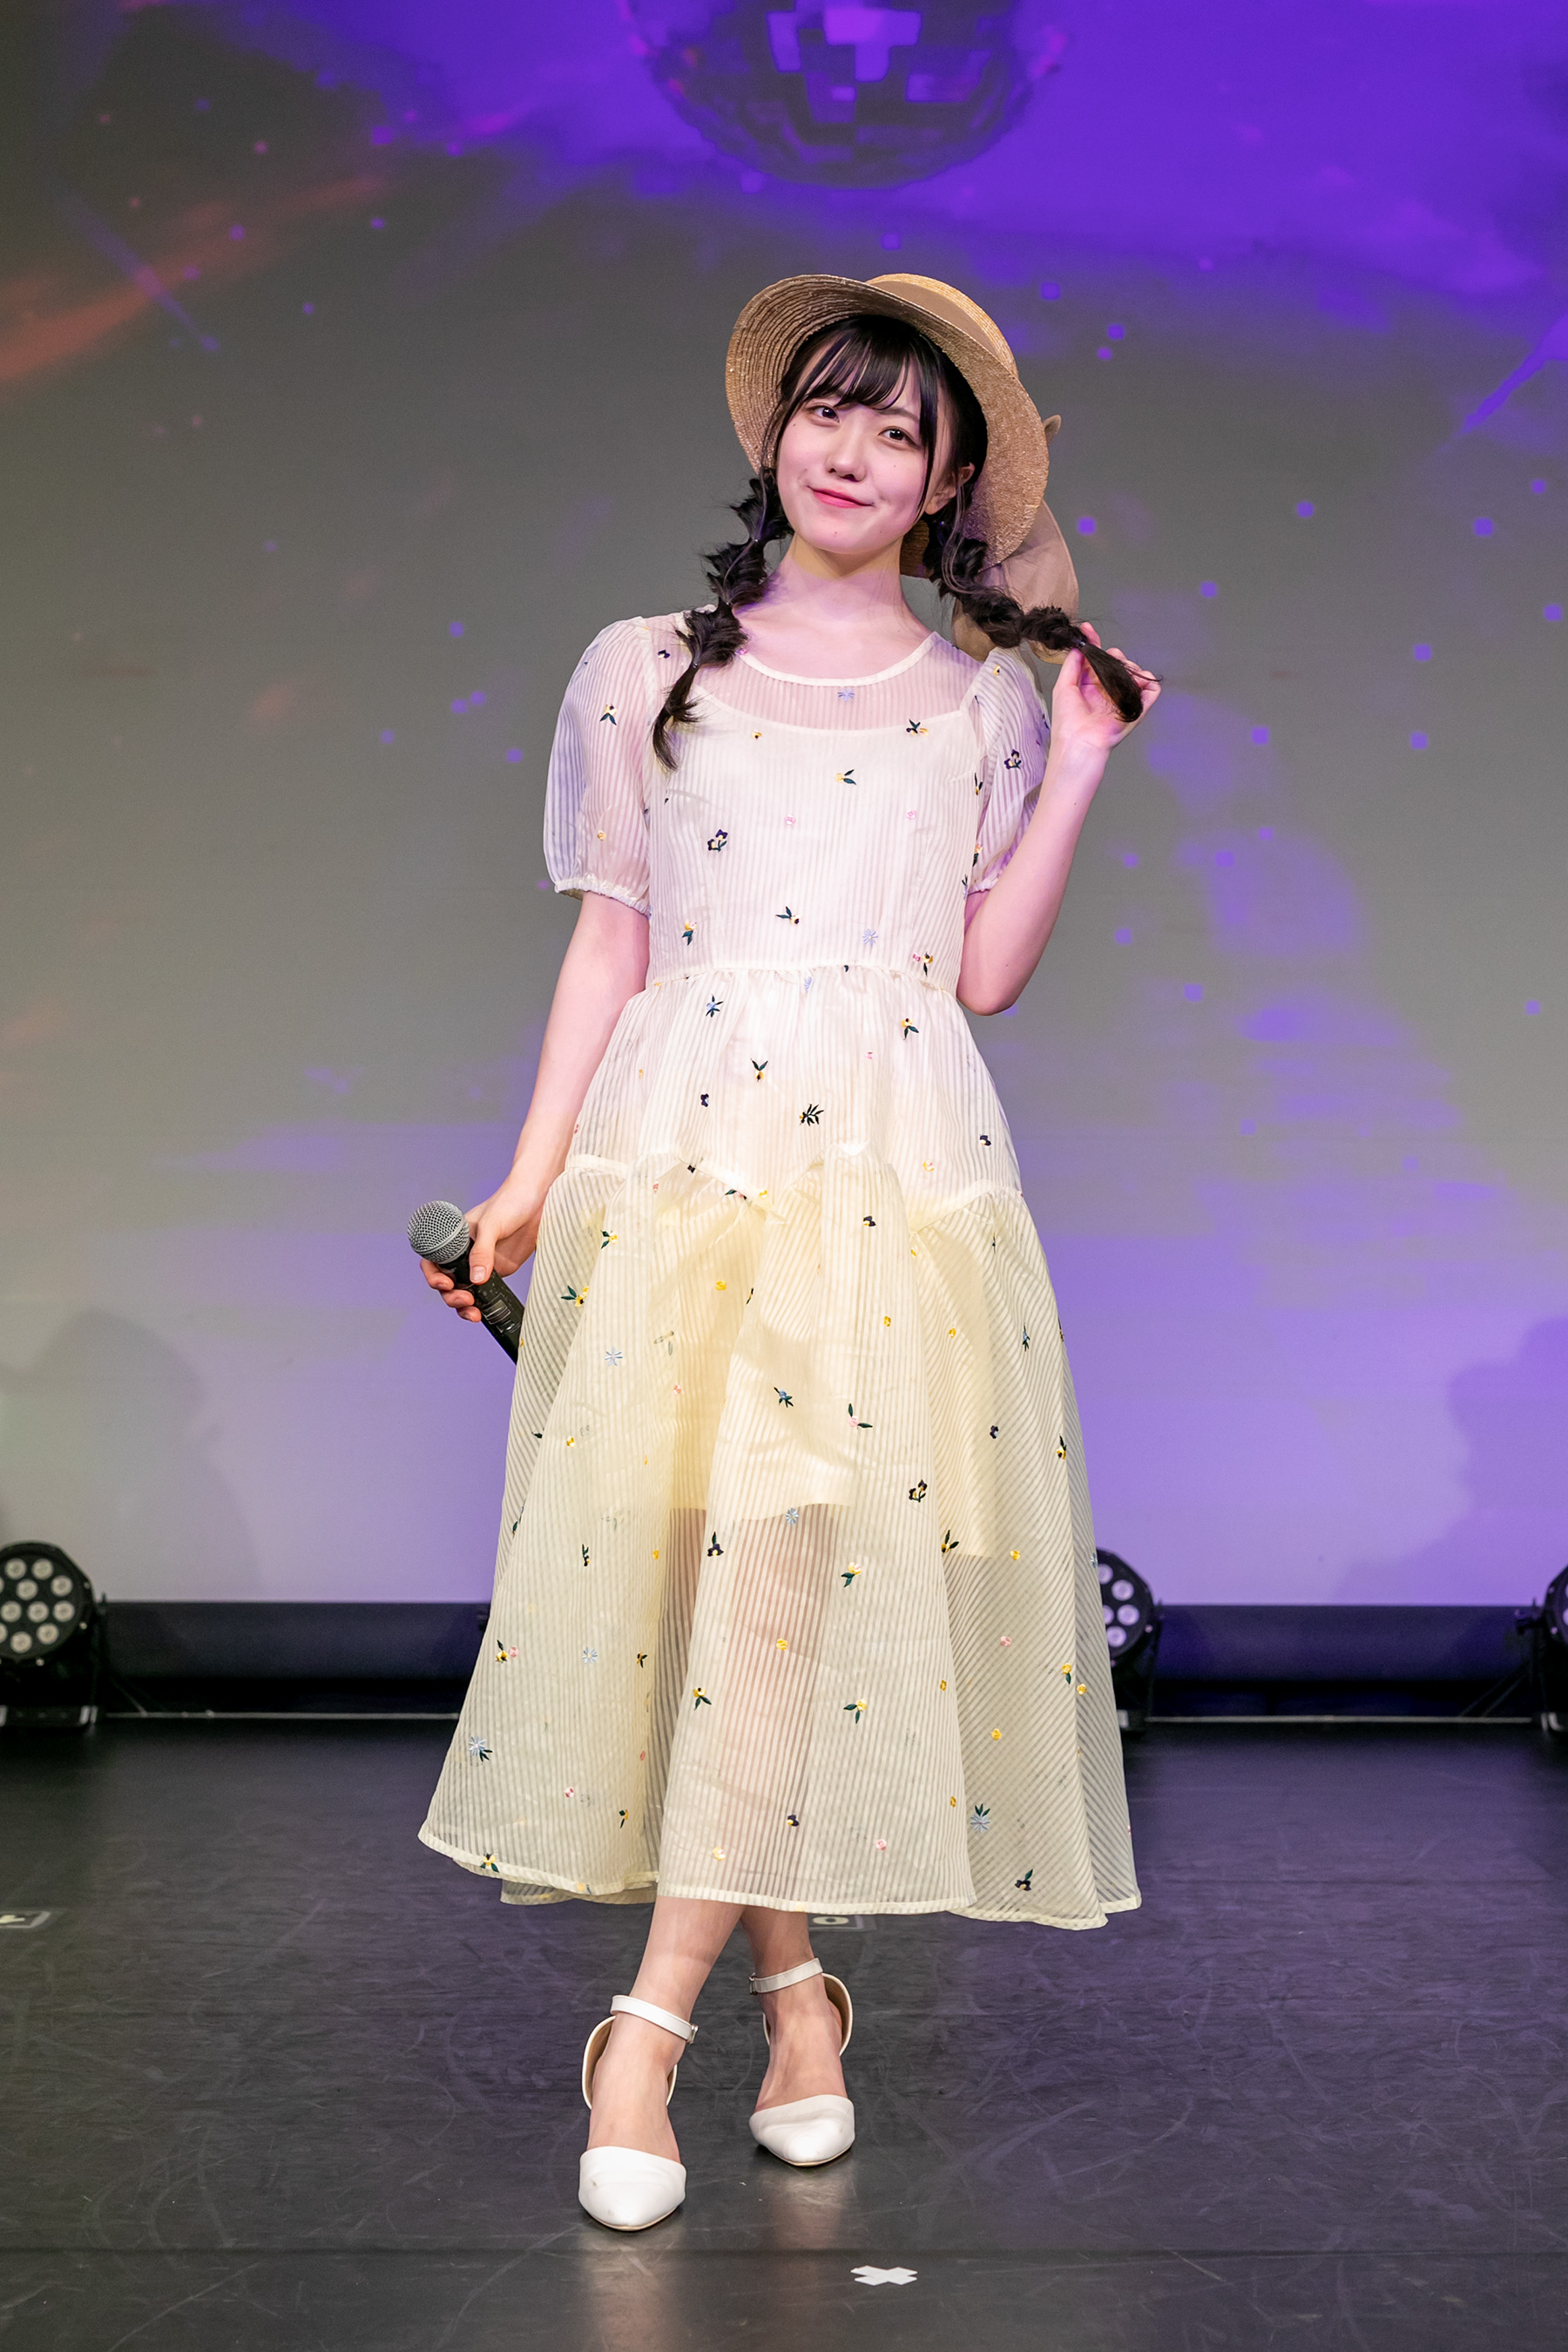 Nazuna Higuchi from SUPER GiRLS